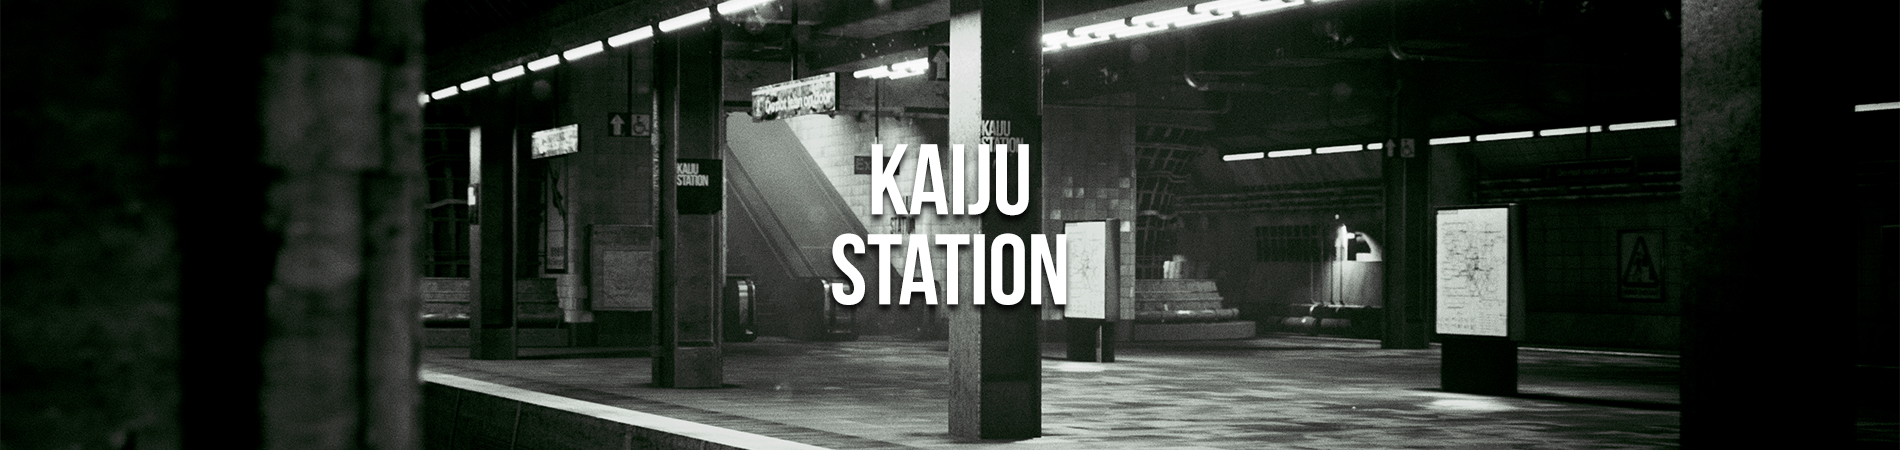 Kaiju Station